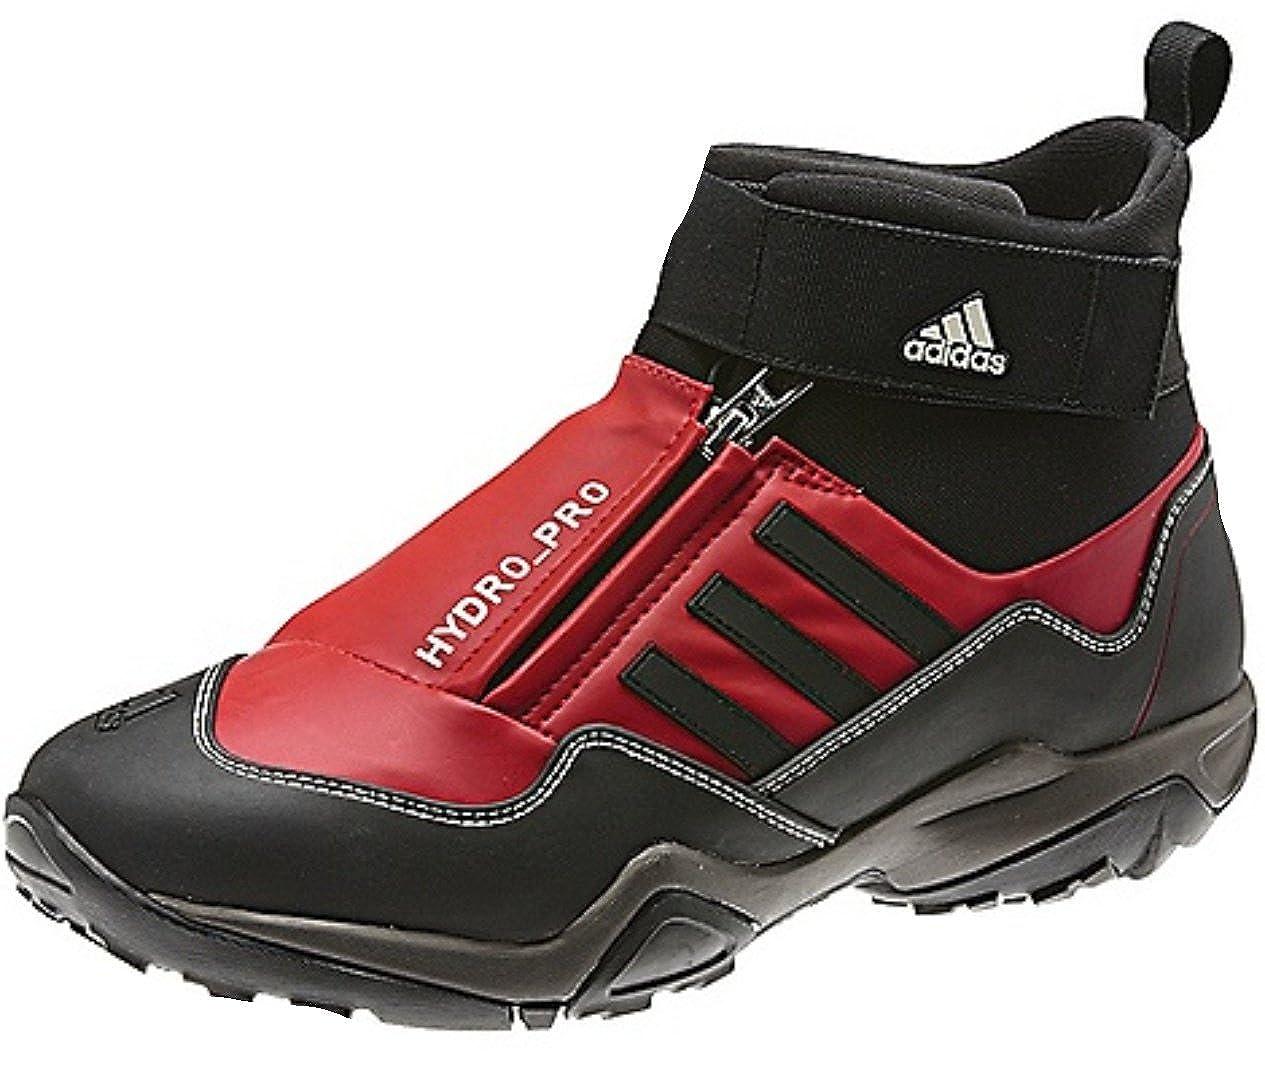 Chaussure de canyoning Adidas Terrex hydro Pro Prix pas